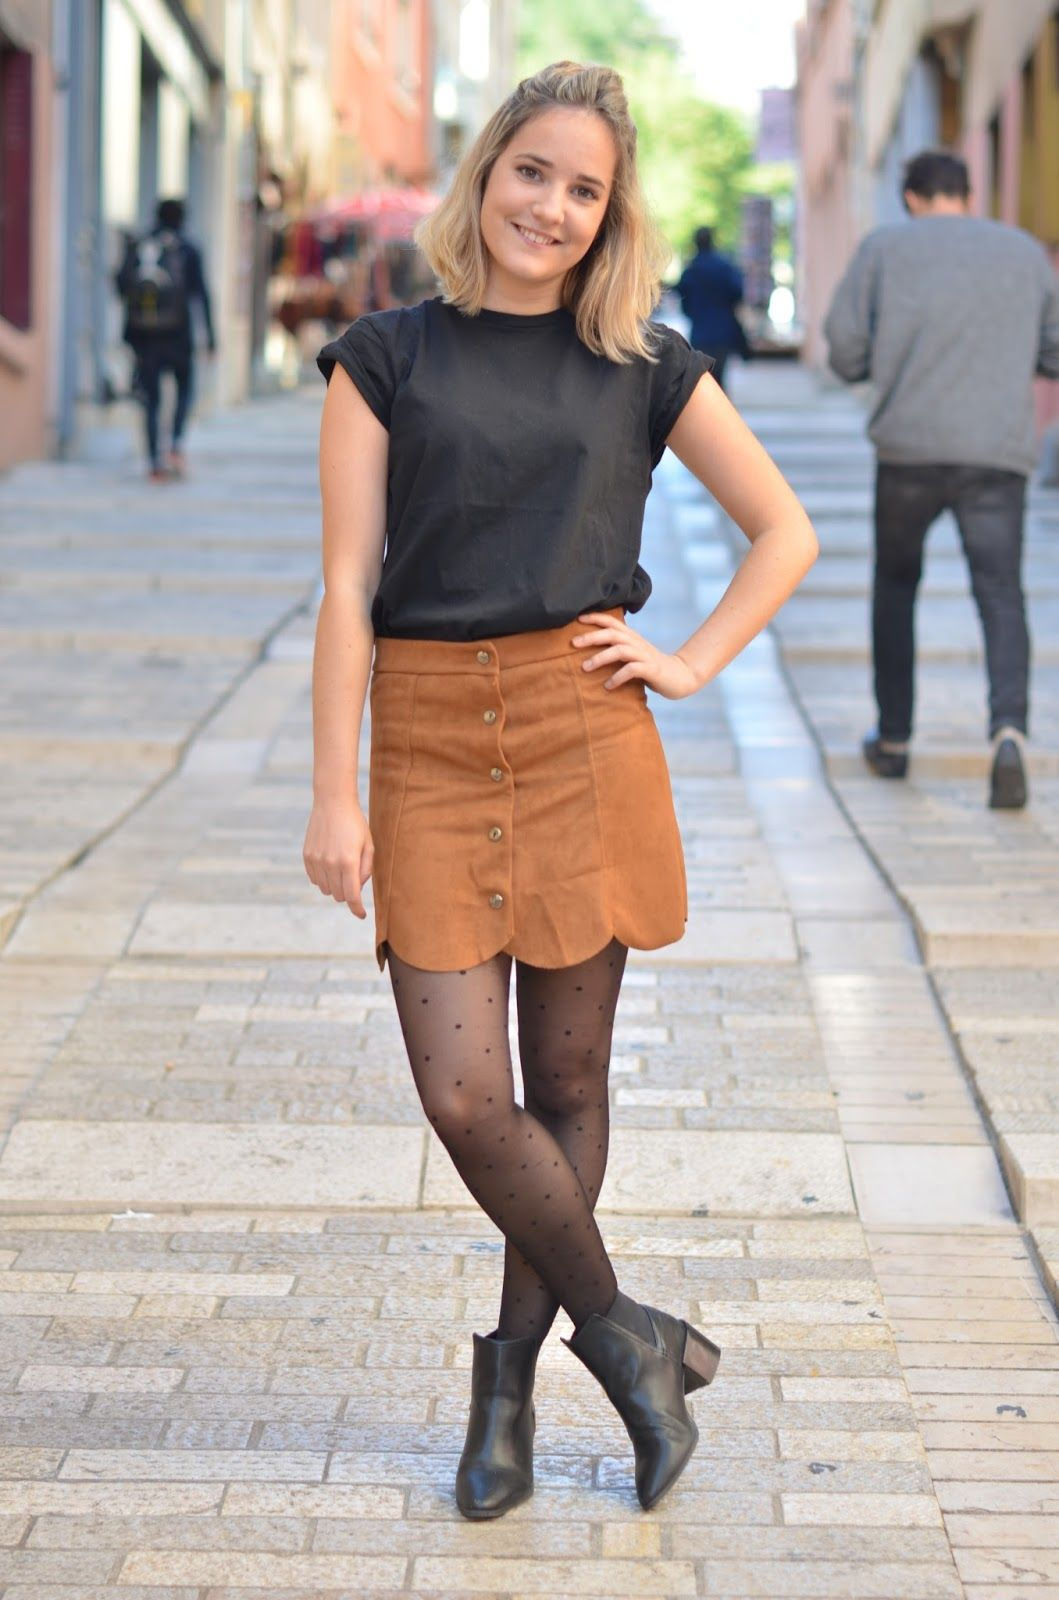 6a8297bad588 Jumelle Ln - Blogueuses Lyonnaises Alice et Clara - Blog Mode Lyon  La Jupe  Suédine